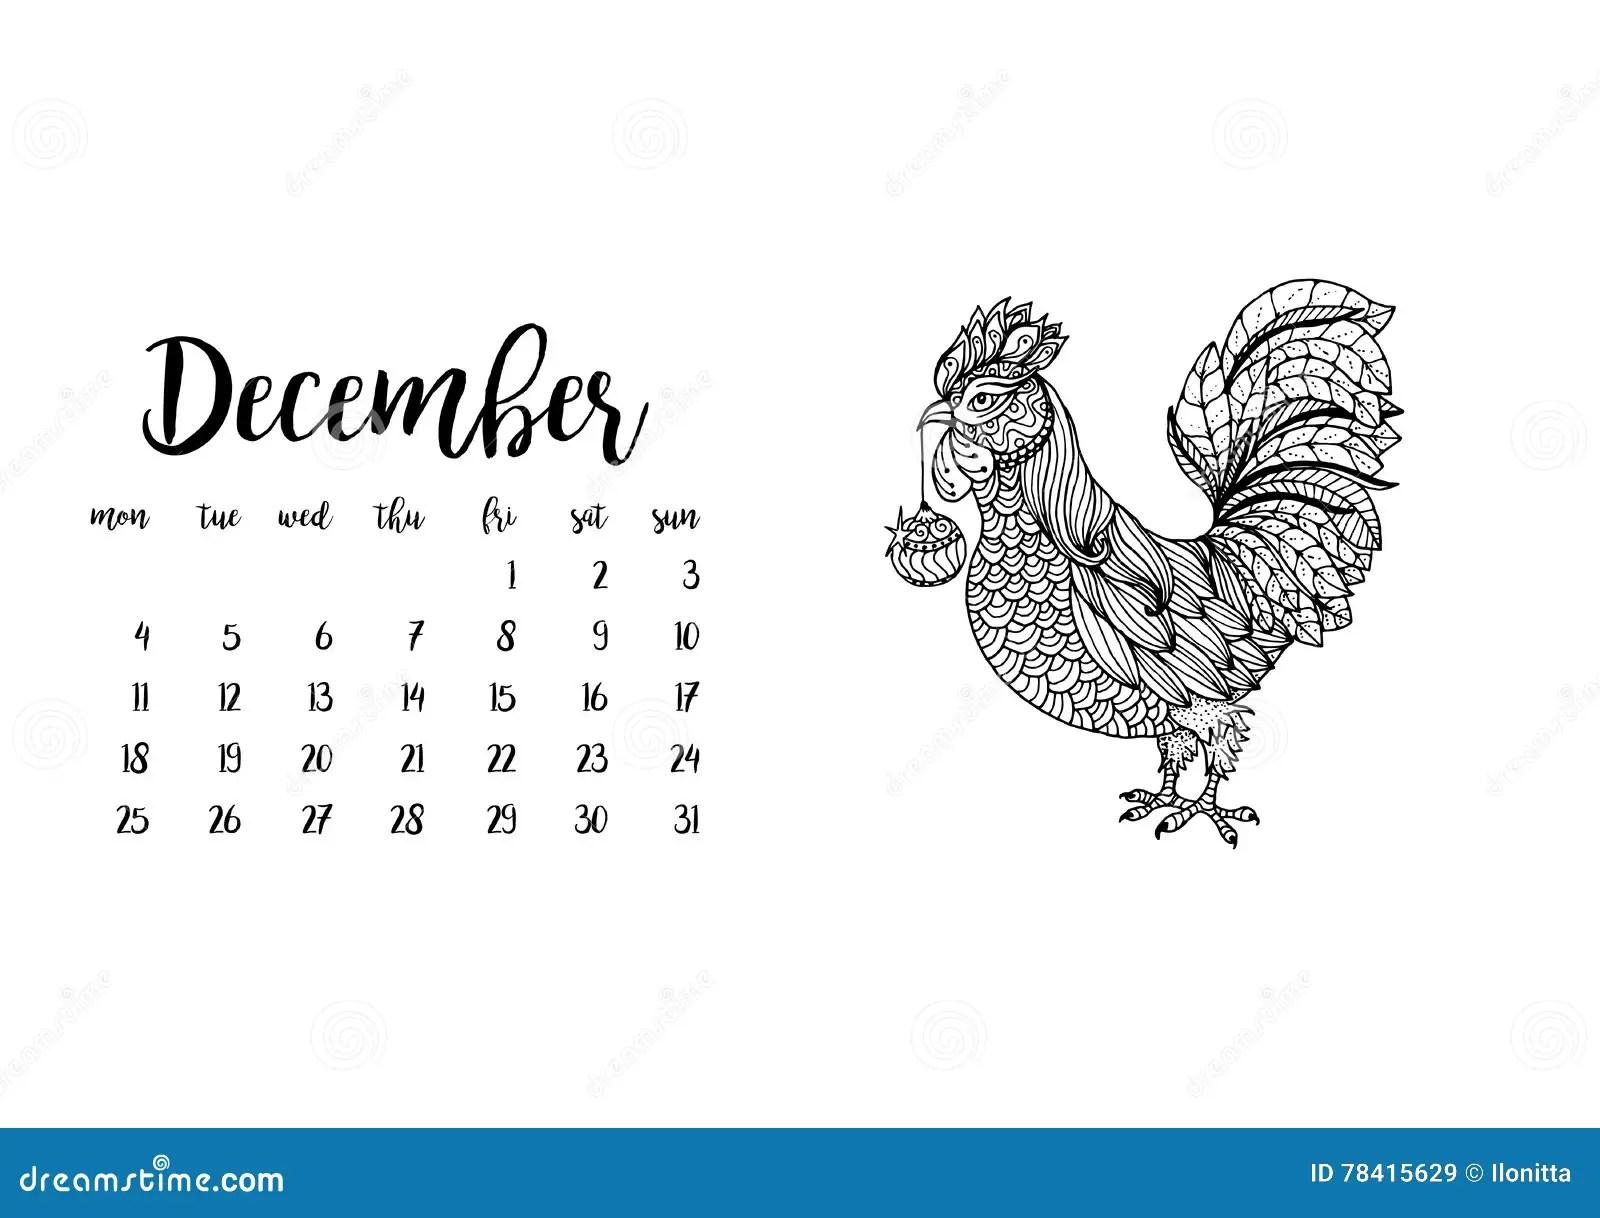 Desk Calendar Template For Month December With Doodle